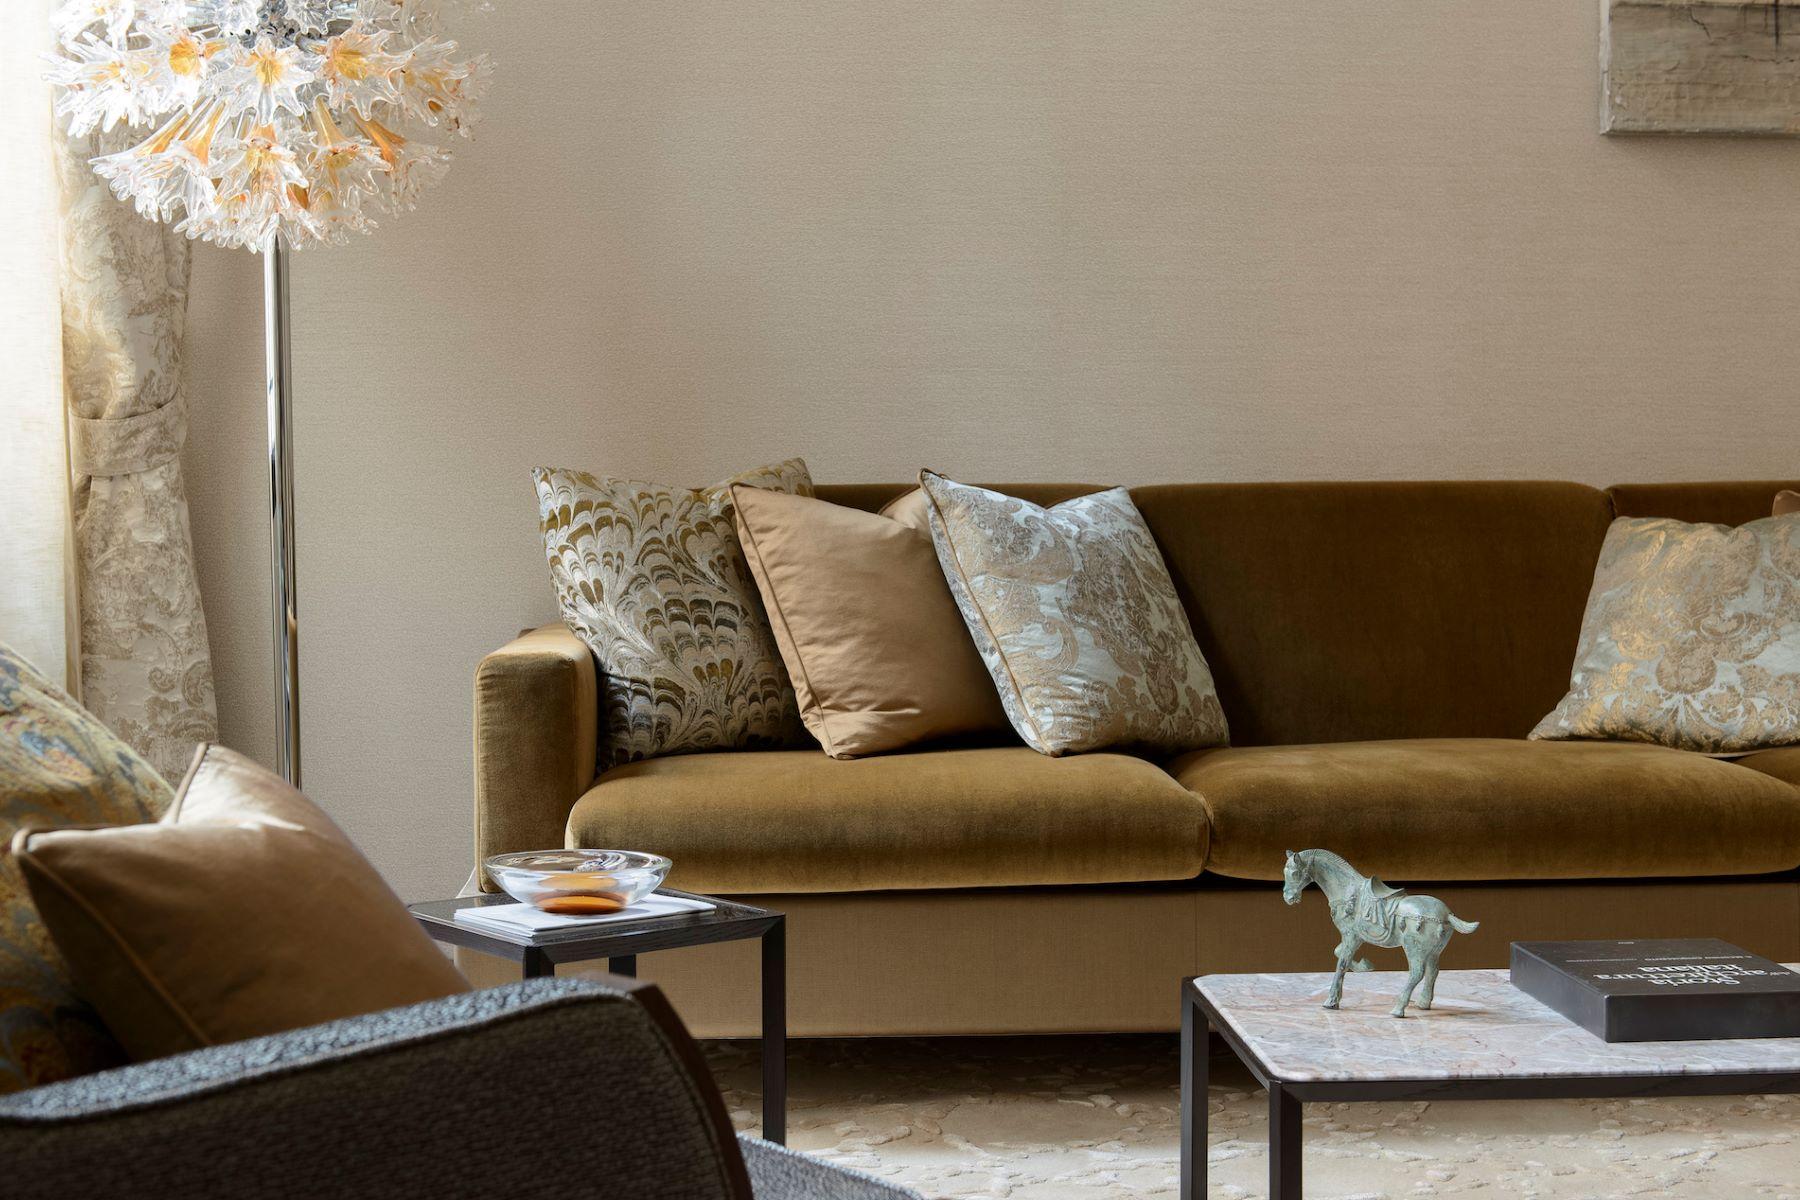 Additional photo for property listing at Vignole apartment at Palazzo Moro Venice Venice Venice, Venice 30124 Italien